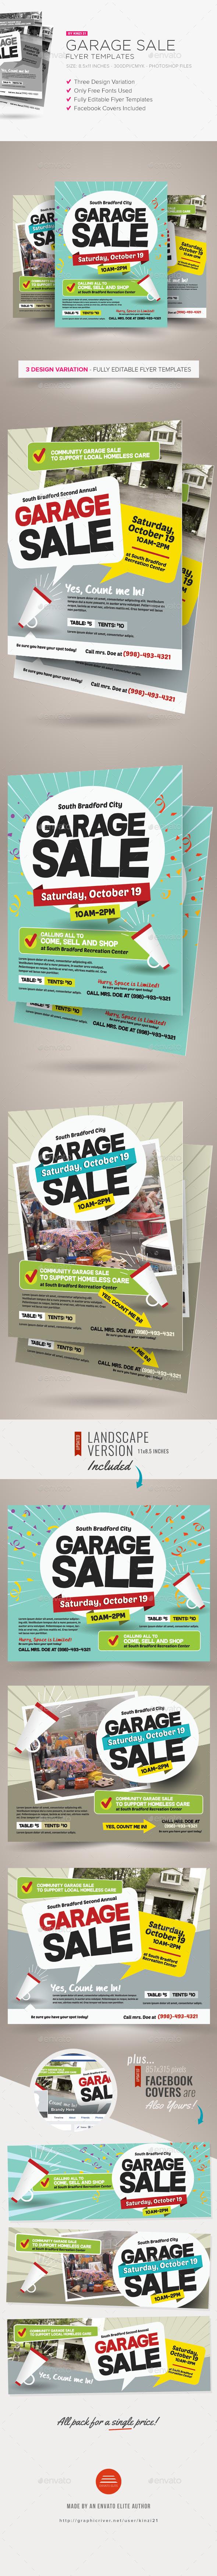 Garage Sale Flyer Templates - Miscellaneous Events